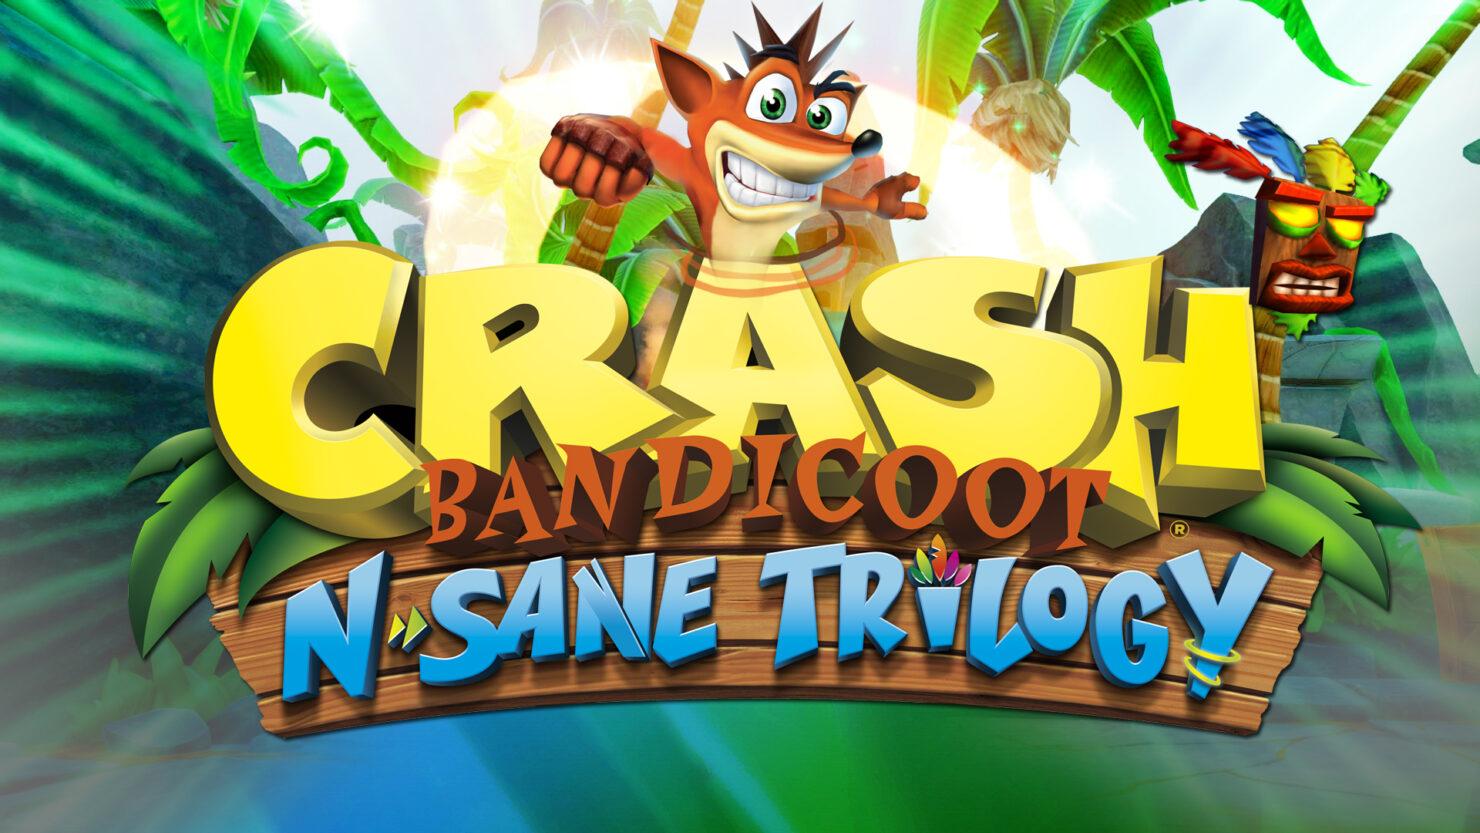 PS Plus February 2020 Crash Bandicoot N. Sane Trilogy